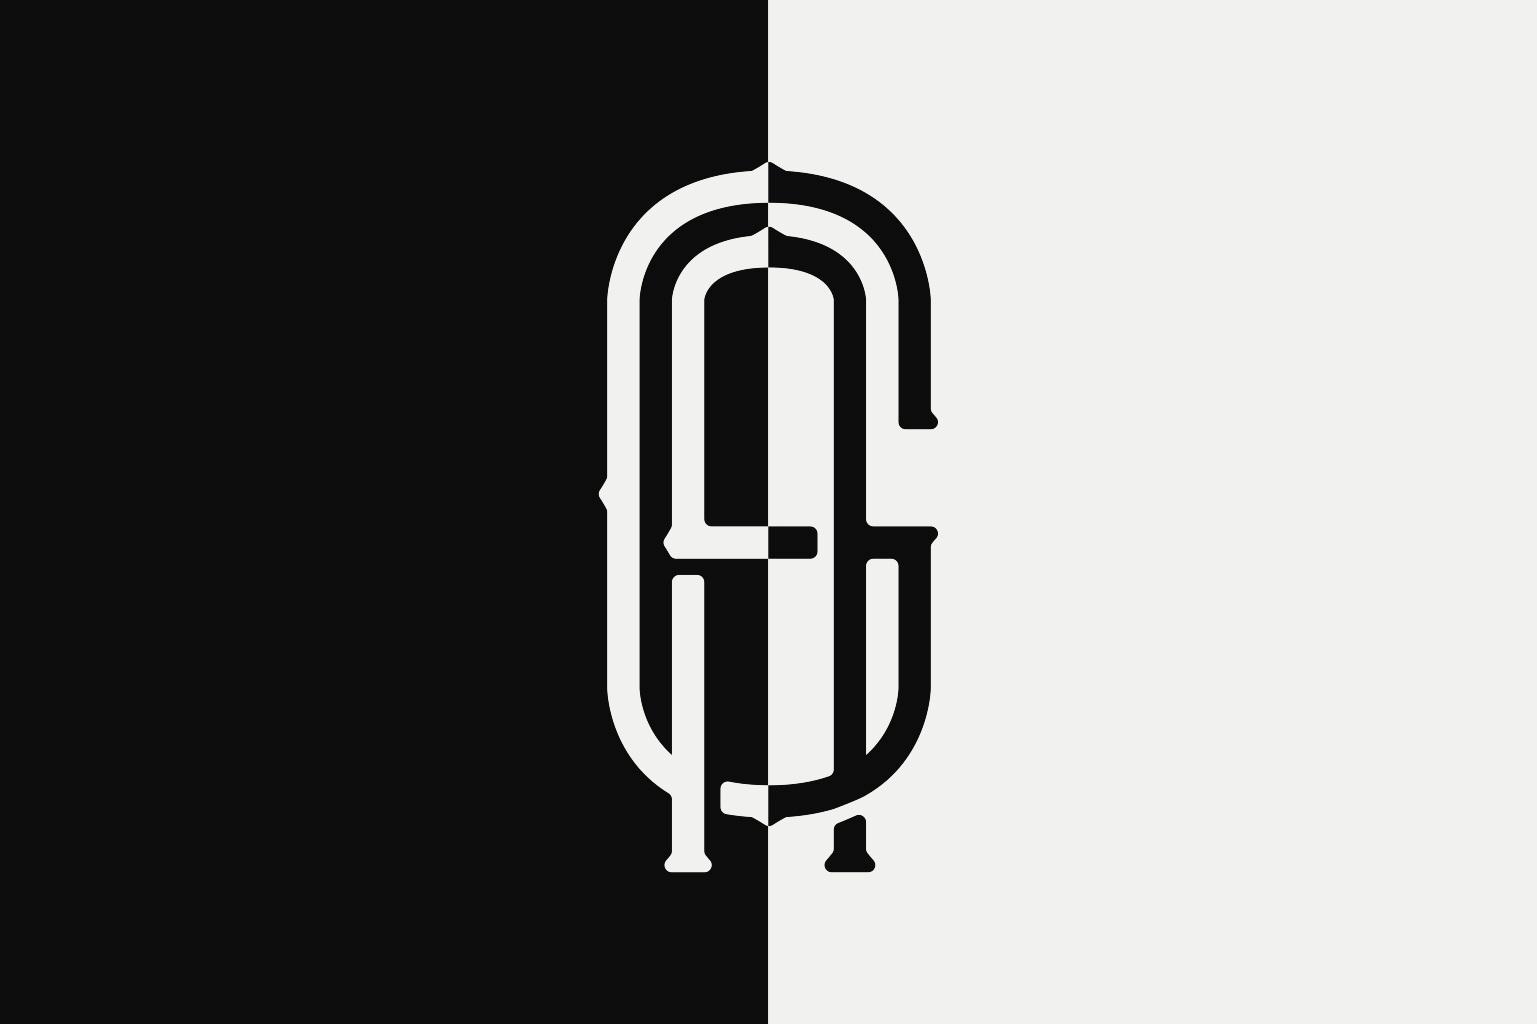 GA_Monogram_2.jpg